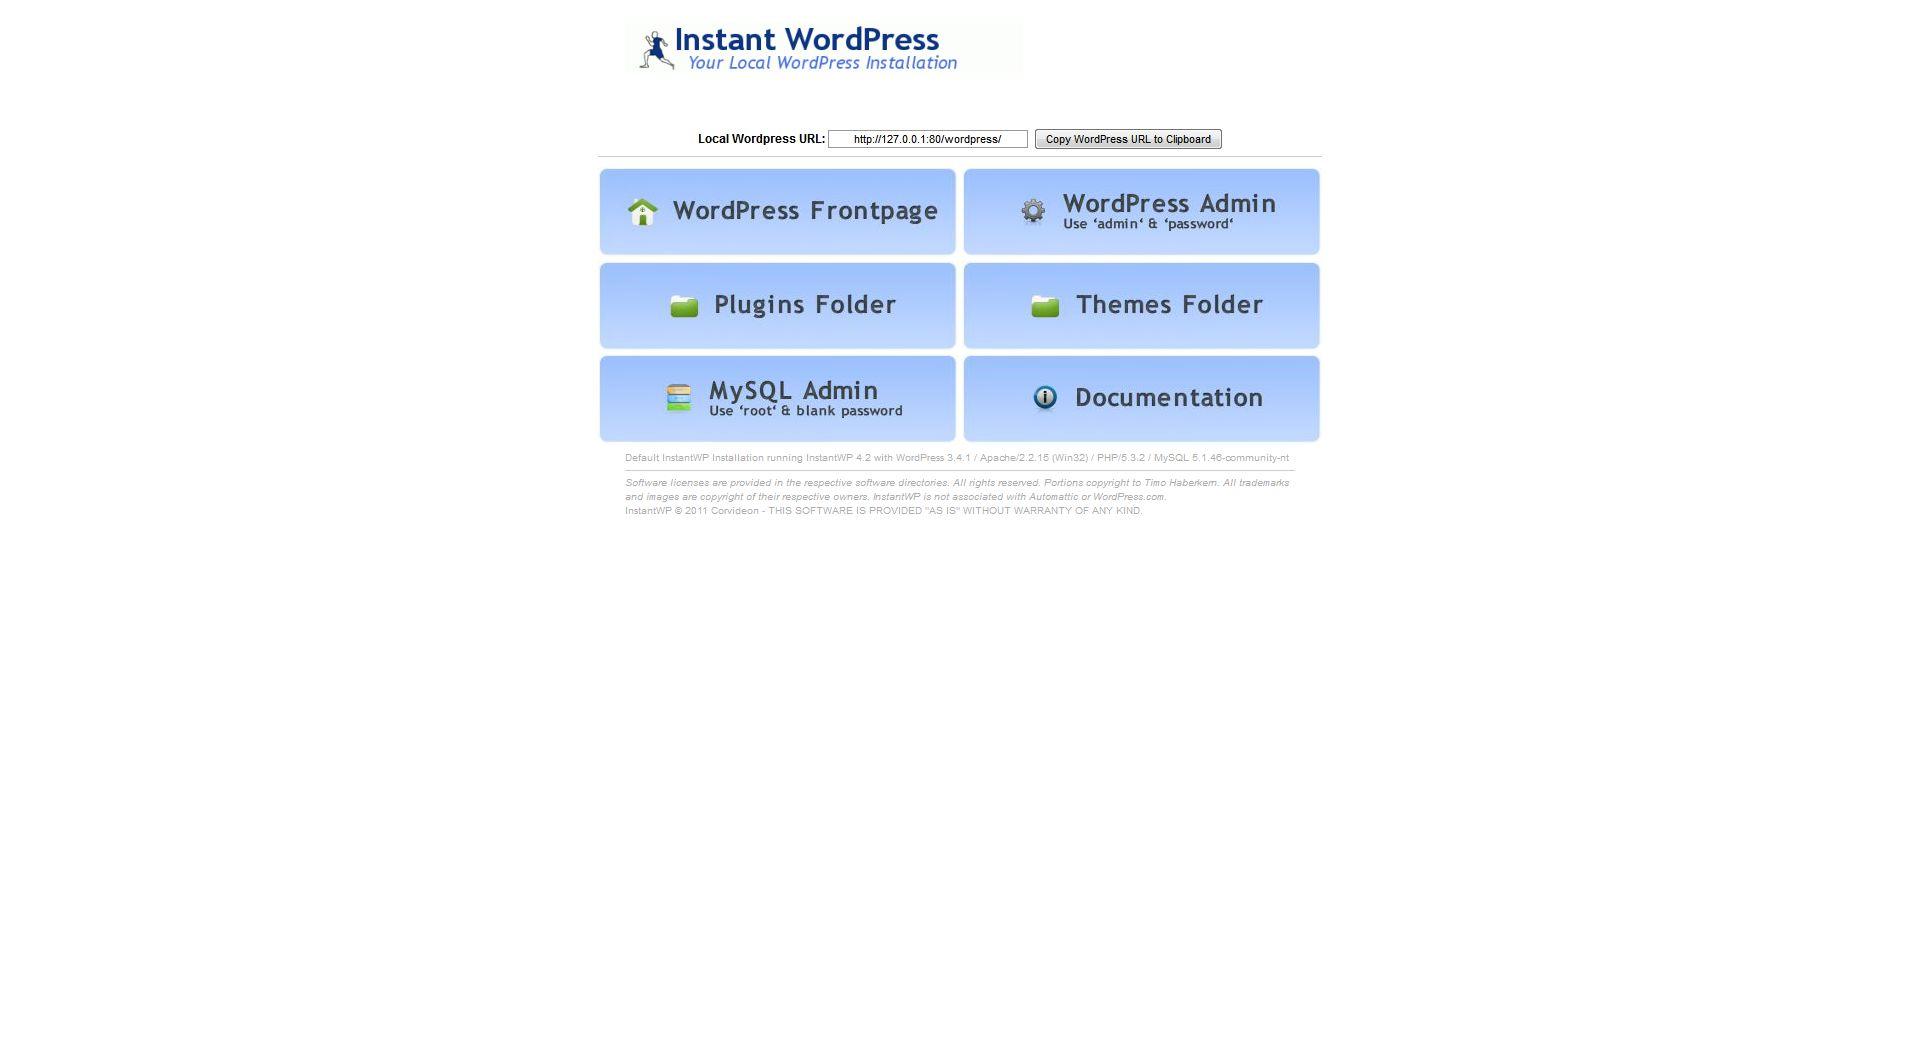 InstantWP dashboard